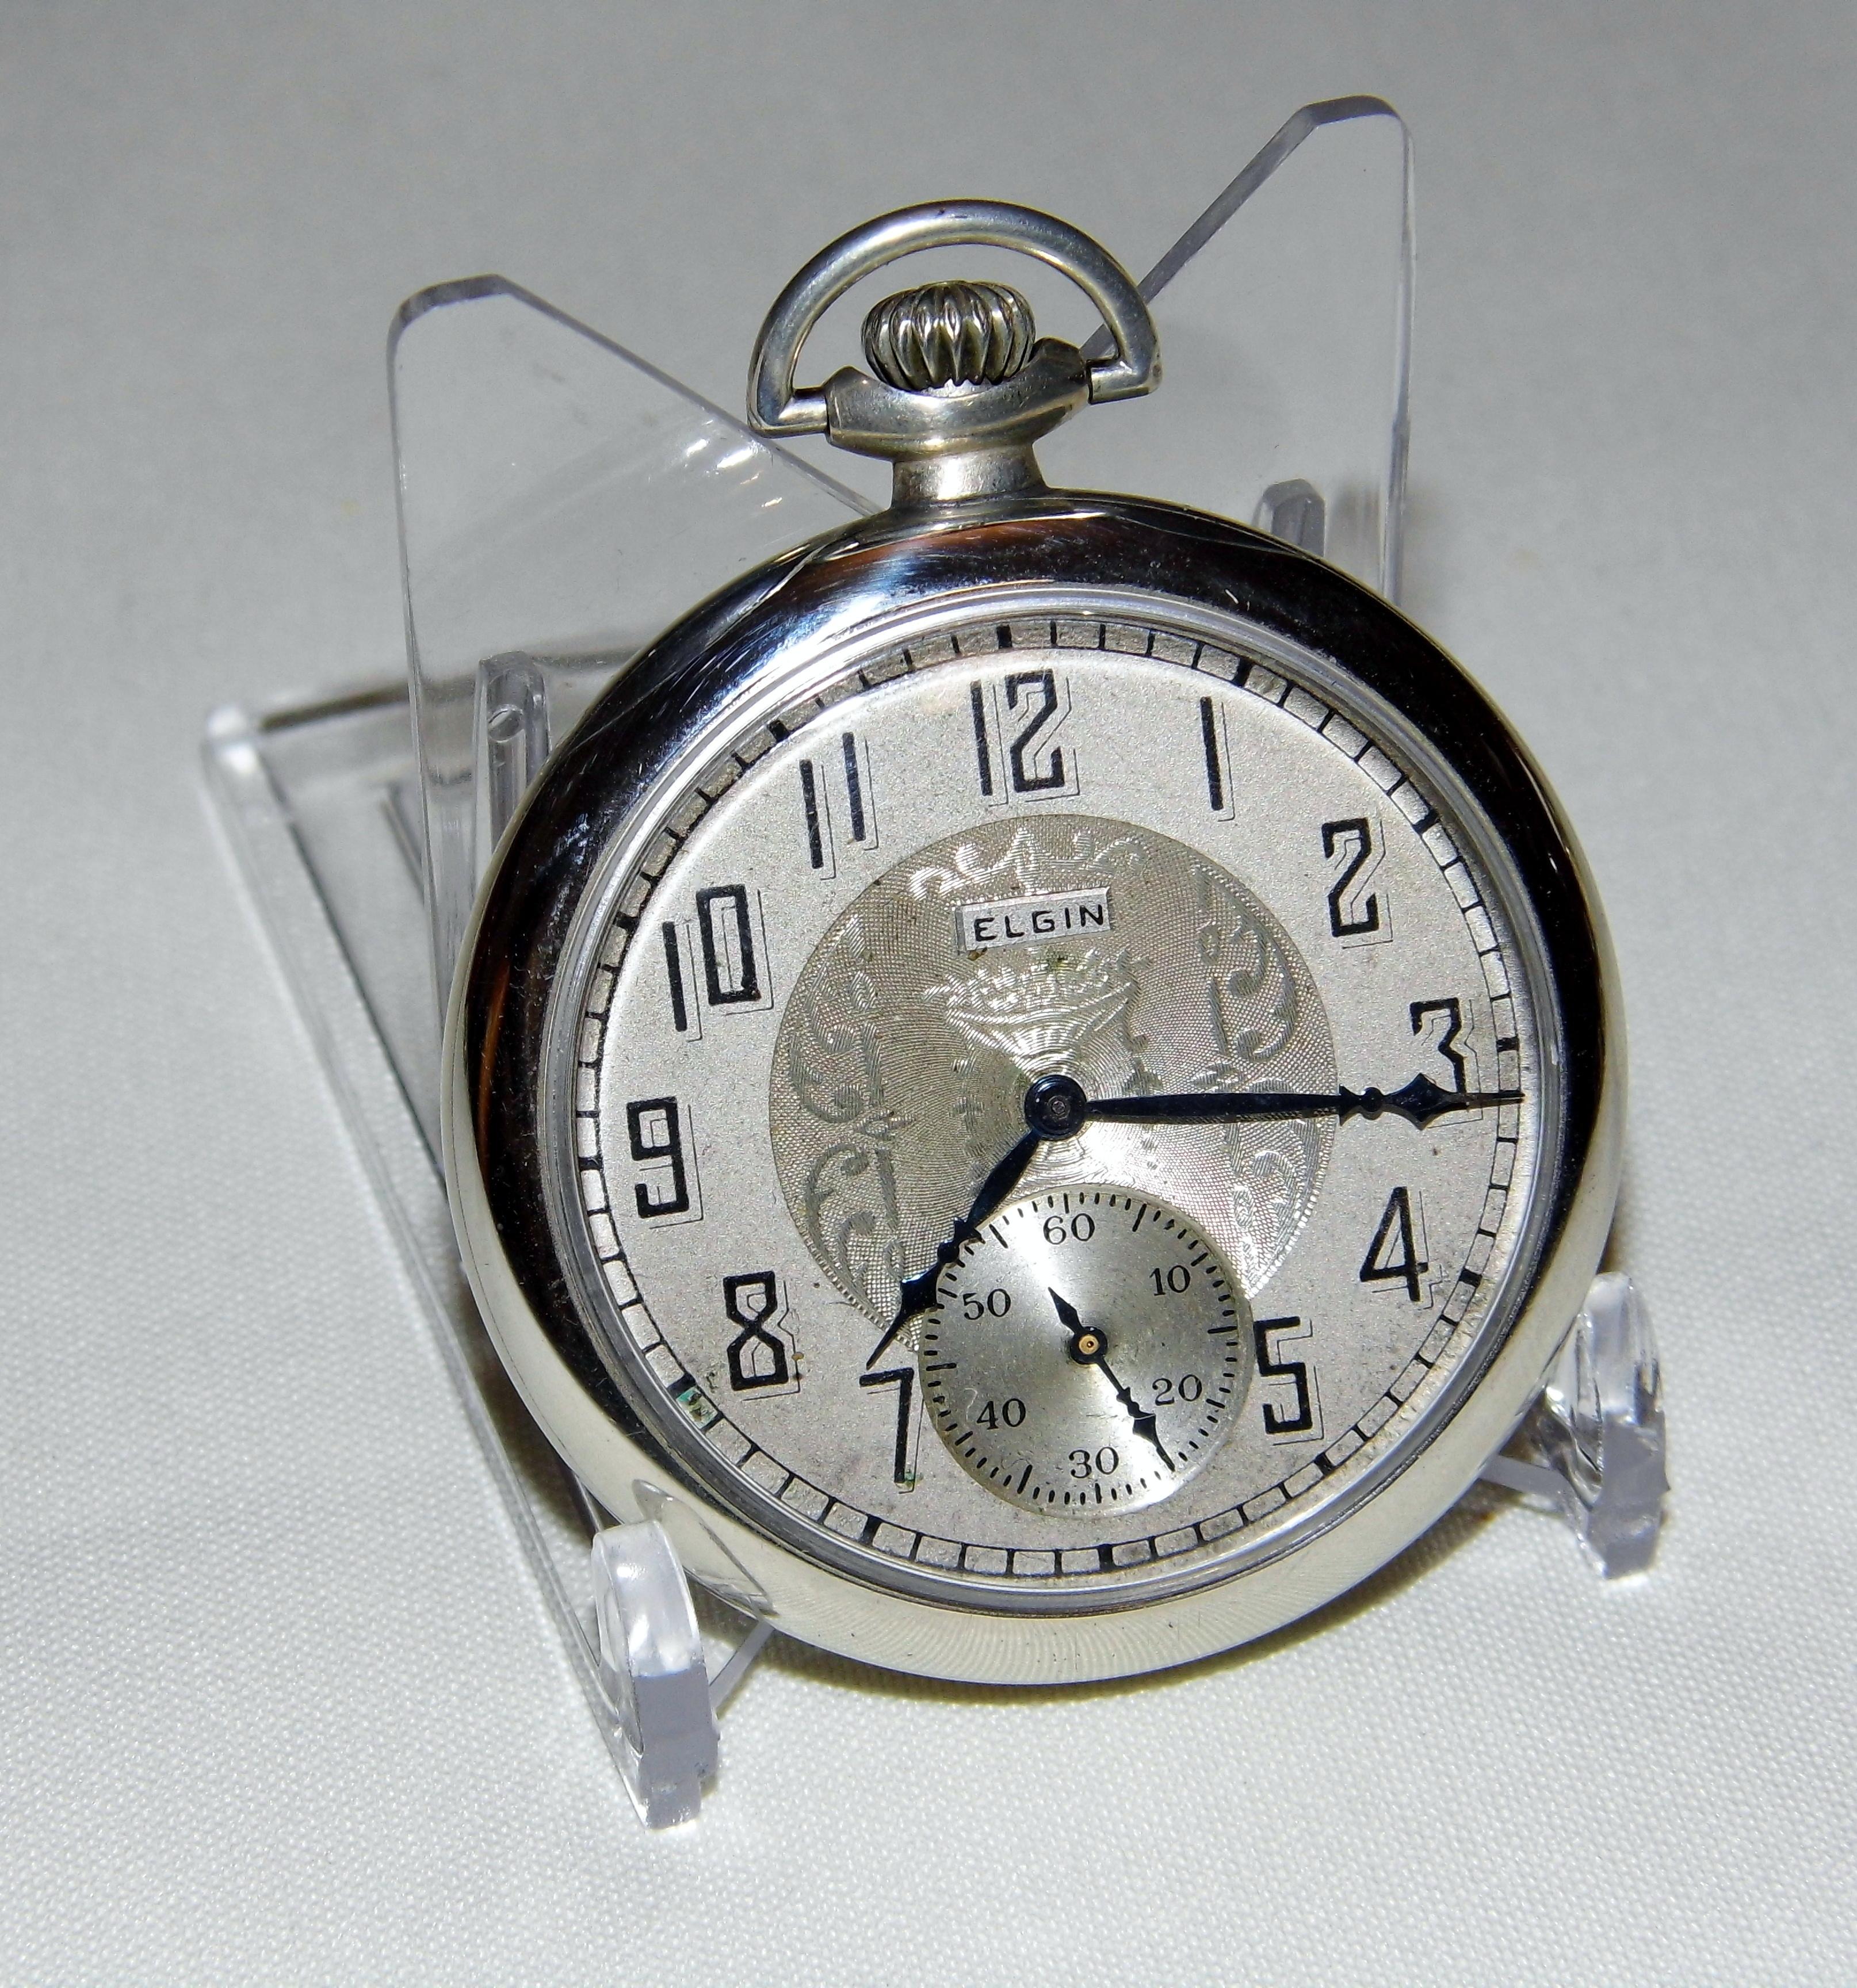 Elgin antique watch pocket dating 2019